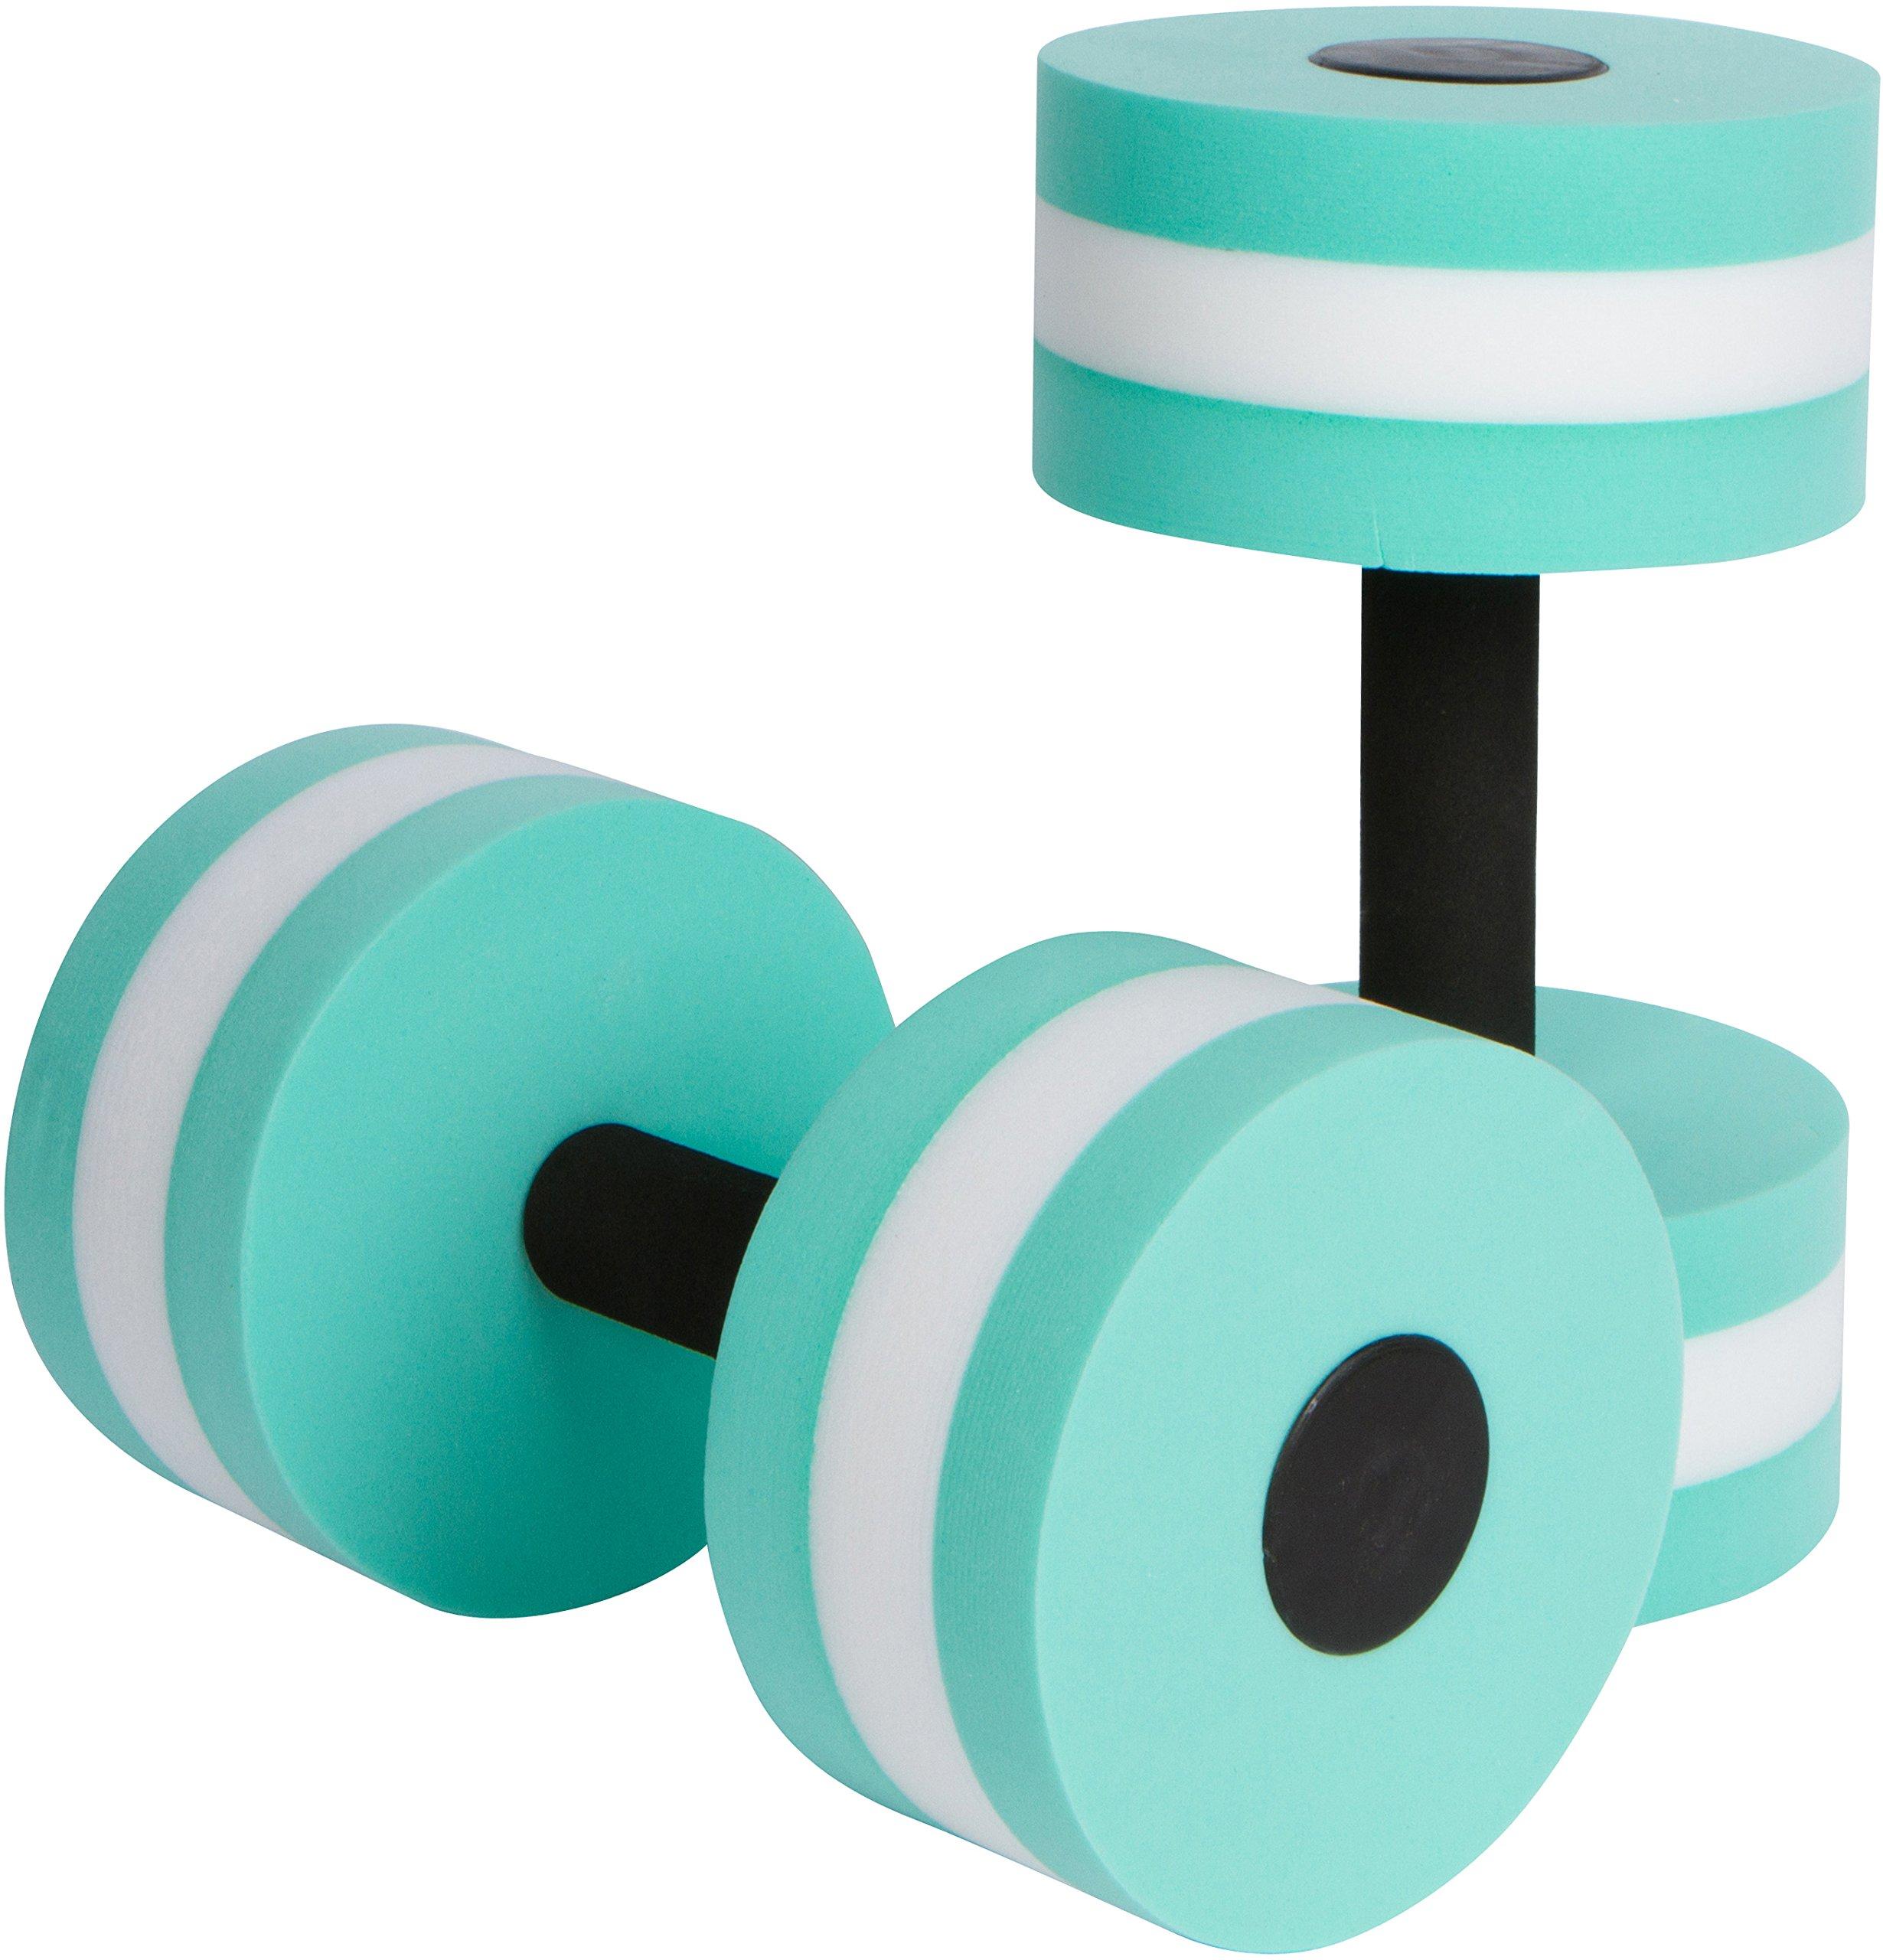 Trademark Innovations Aquatic Exercise Dumbells - Set of 2 Foam - for Water Aerobics (Teal)